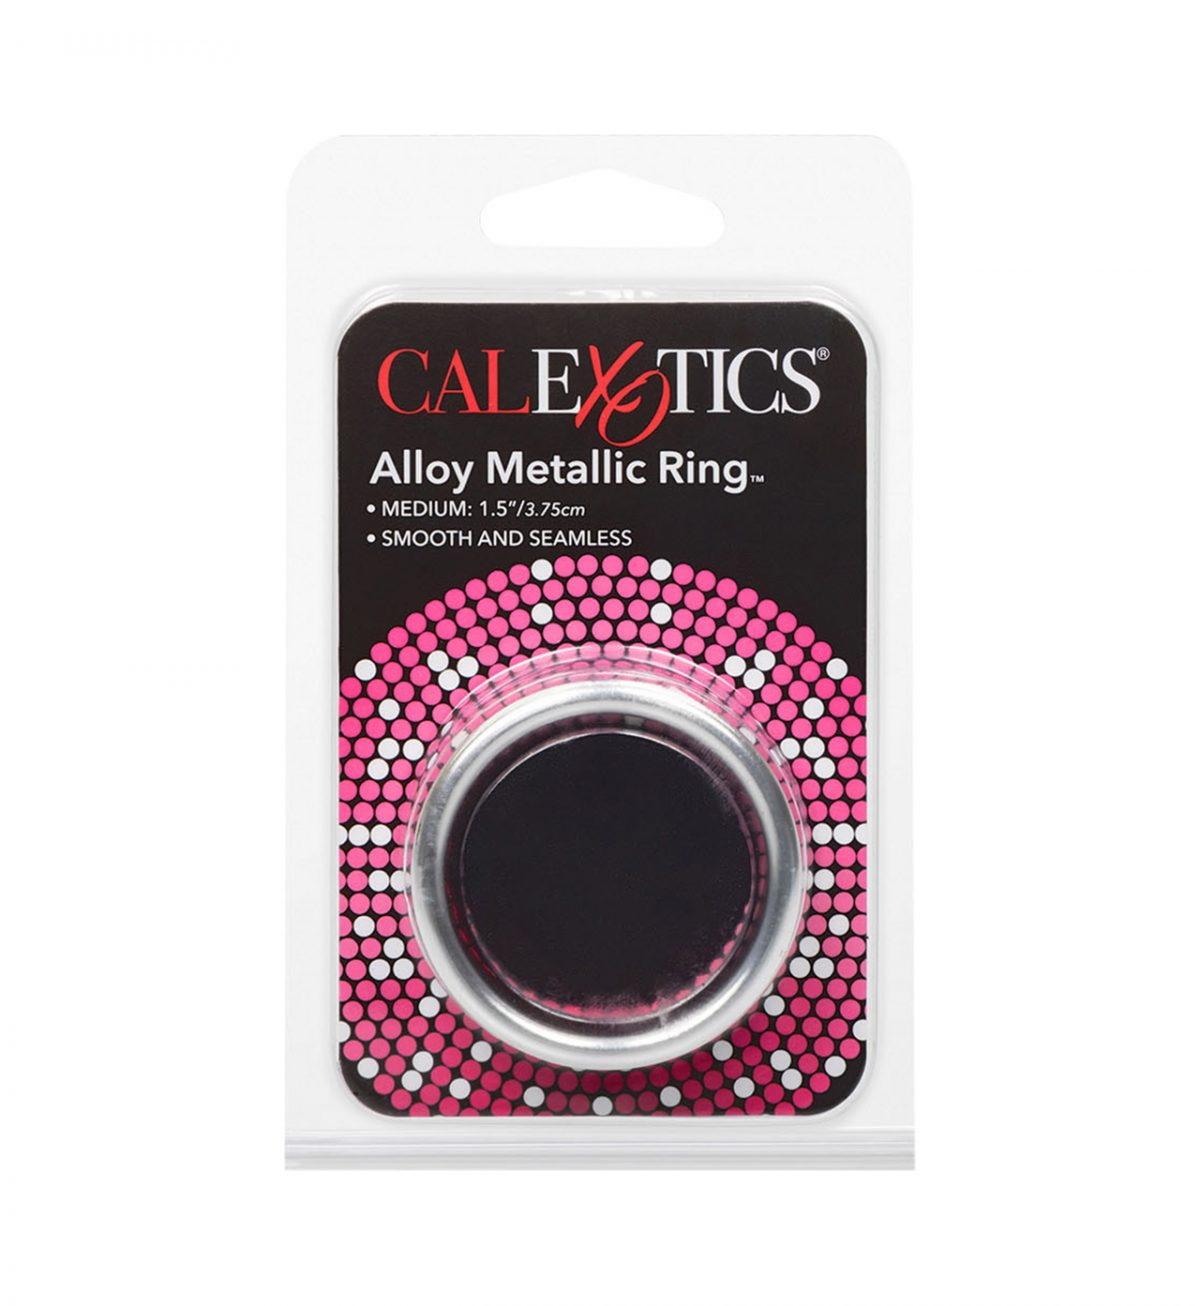 Alloy Metallic Ring – M - Penisring i metall - CalExotics